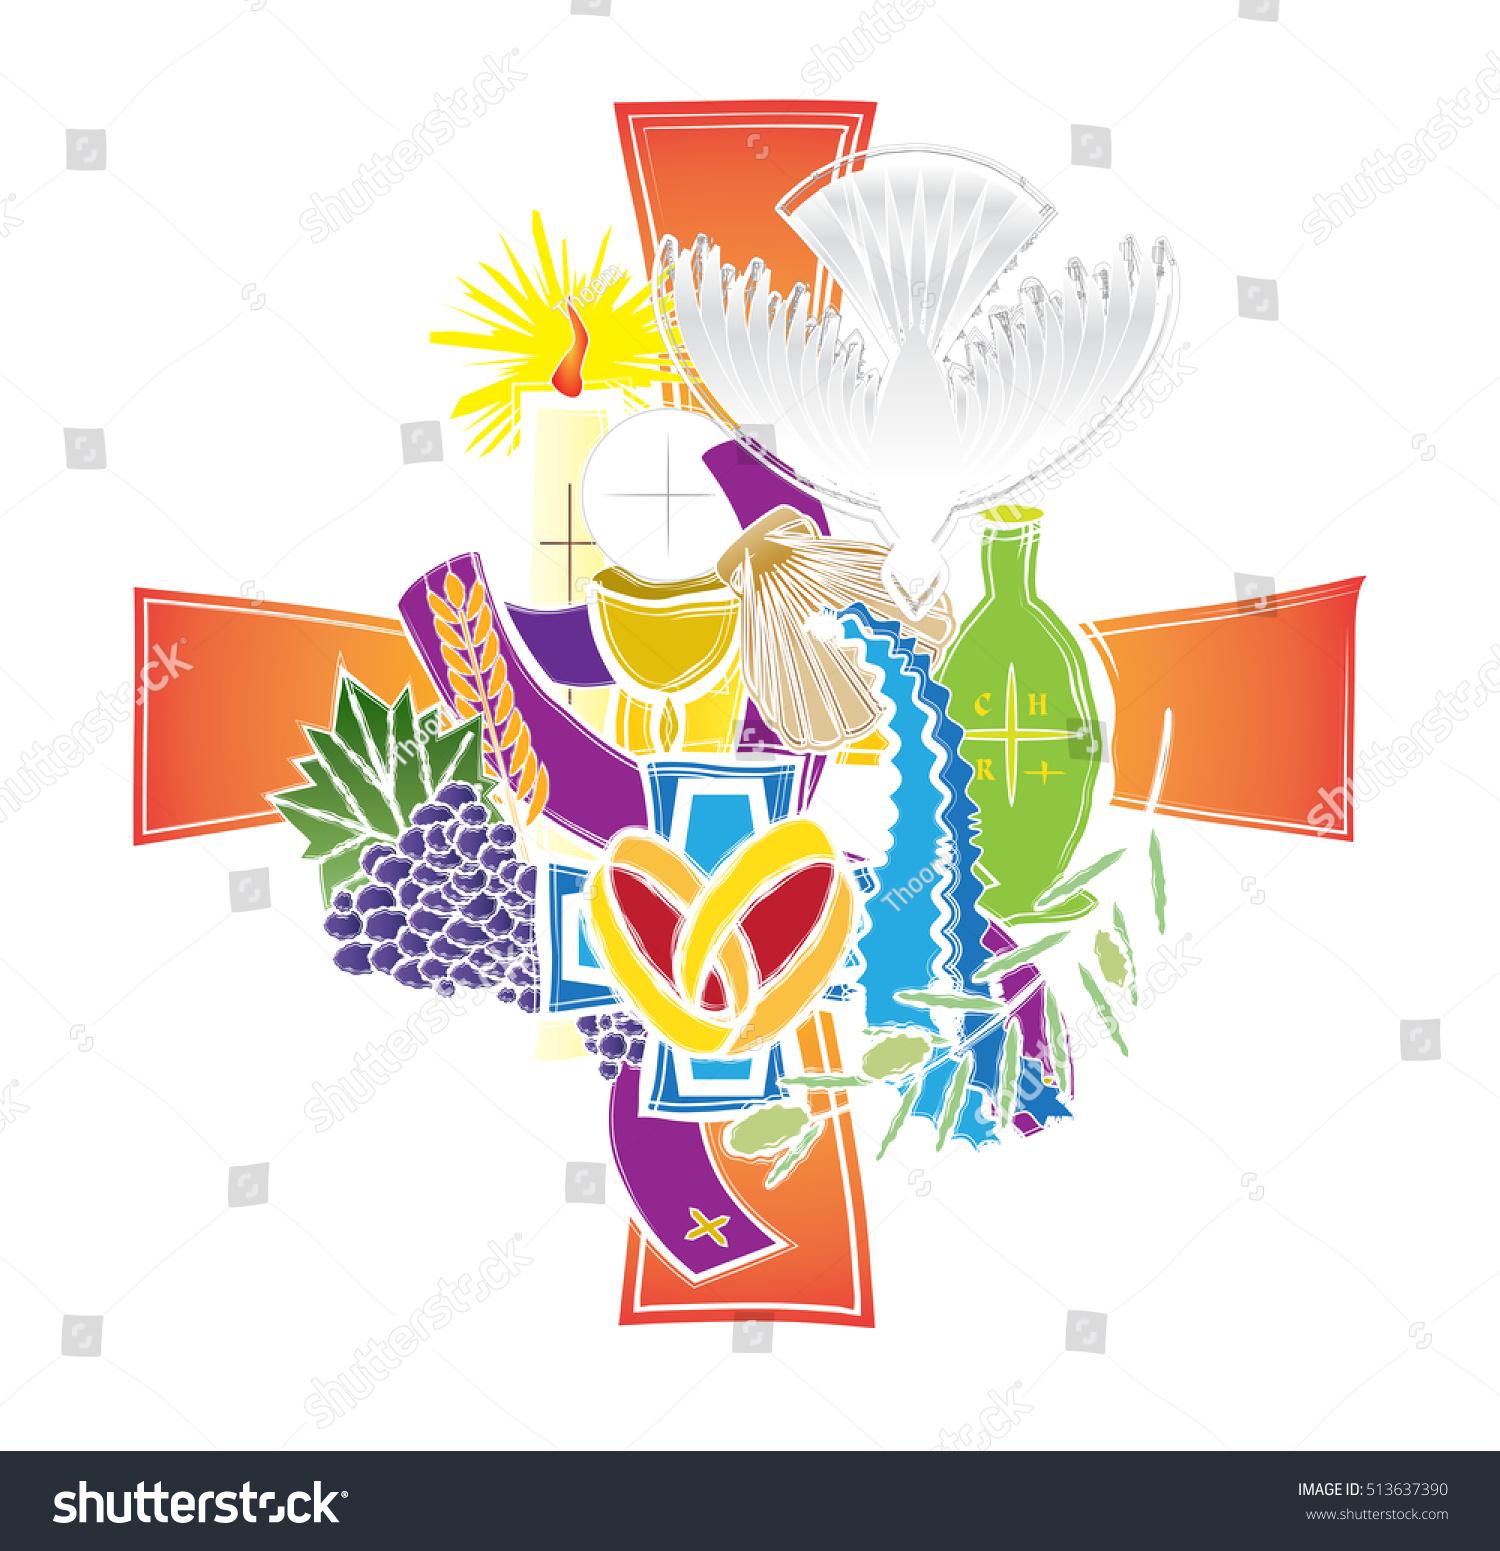 Symbols seven sacraments catholic church abstract stock vector symbols of the seven sacraments of the catholic church abstract artistic modern color vector religious biocorpaavc Image collections